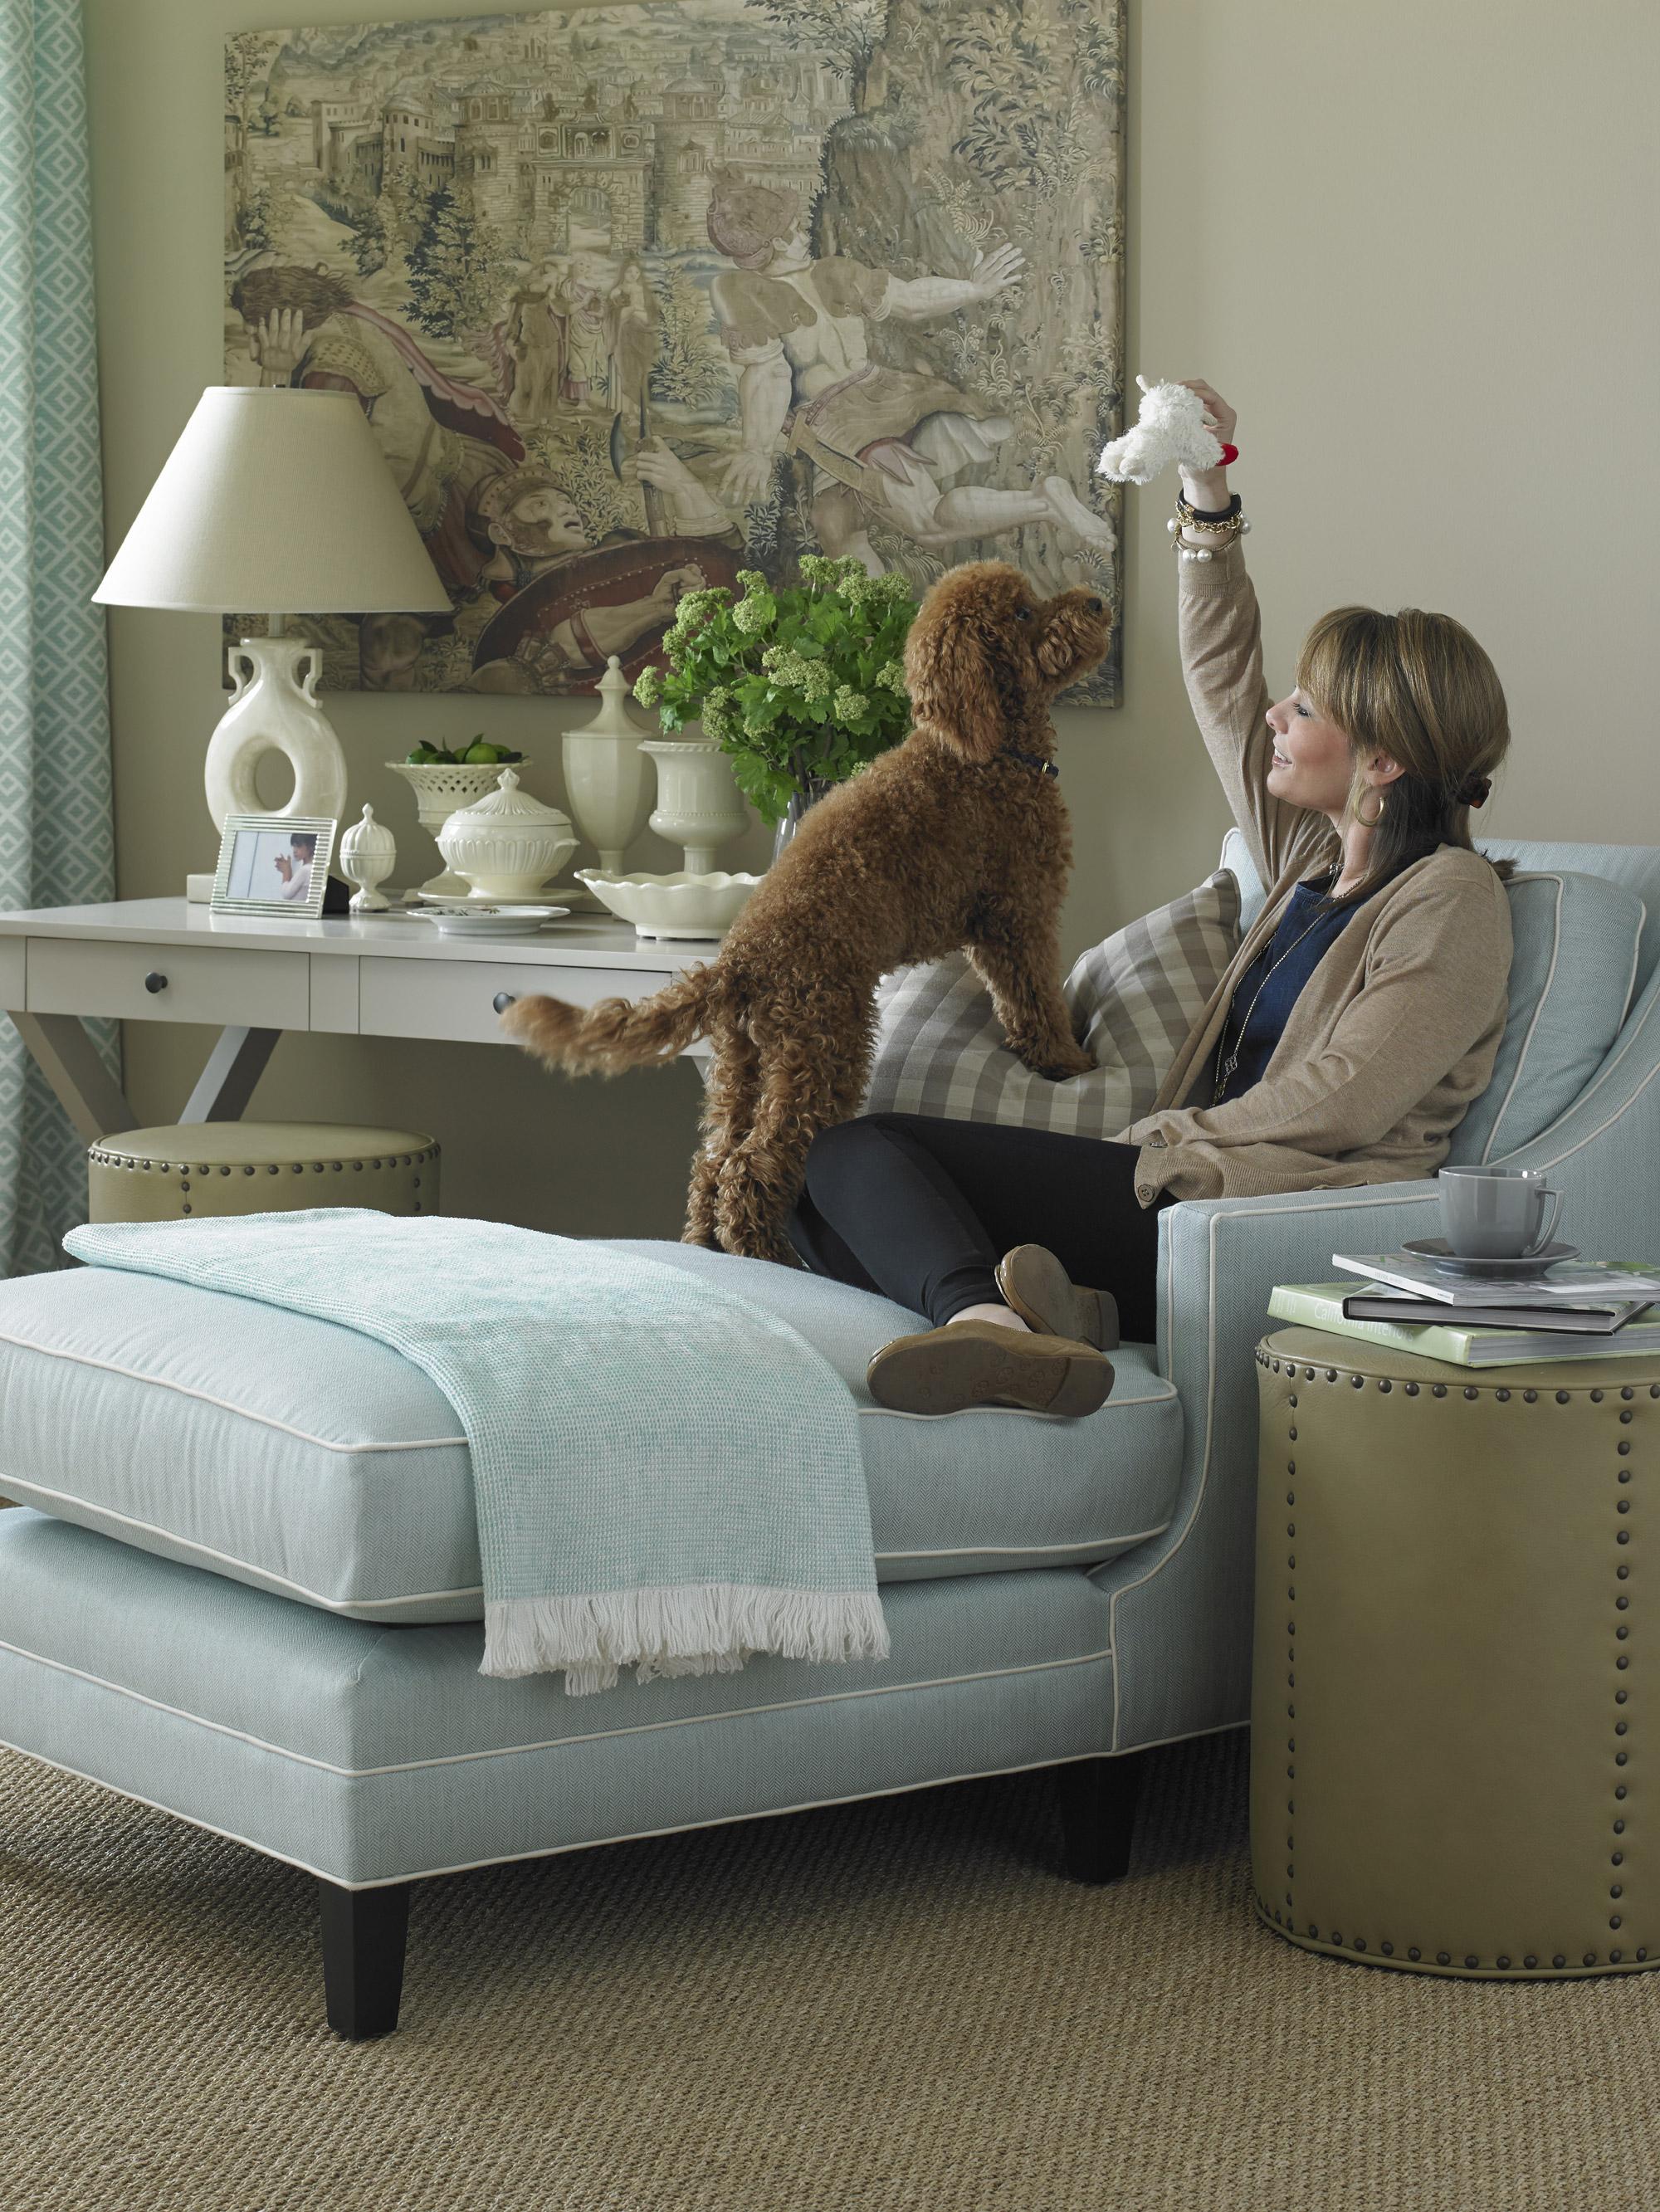 Choosing A Comfortable Sofa Furniture For Living Room Warm